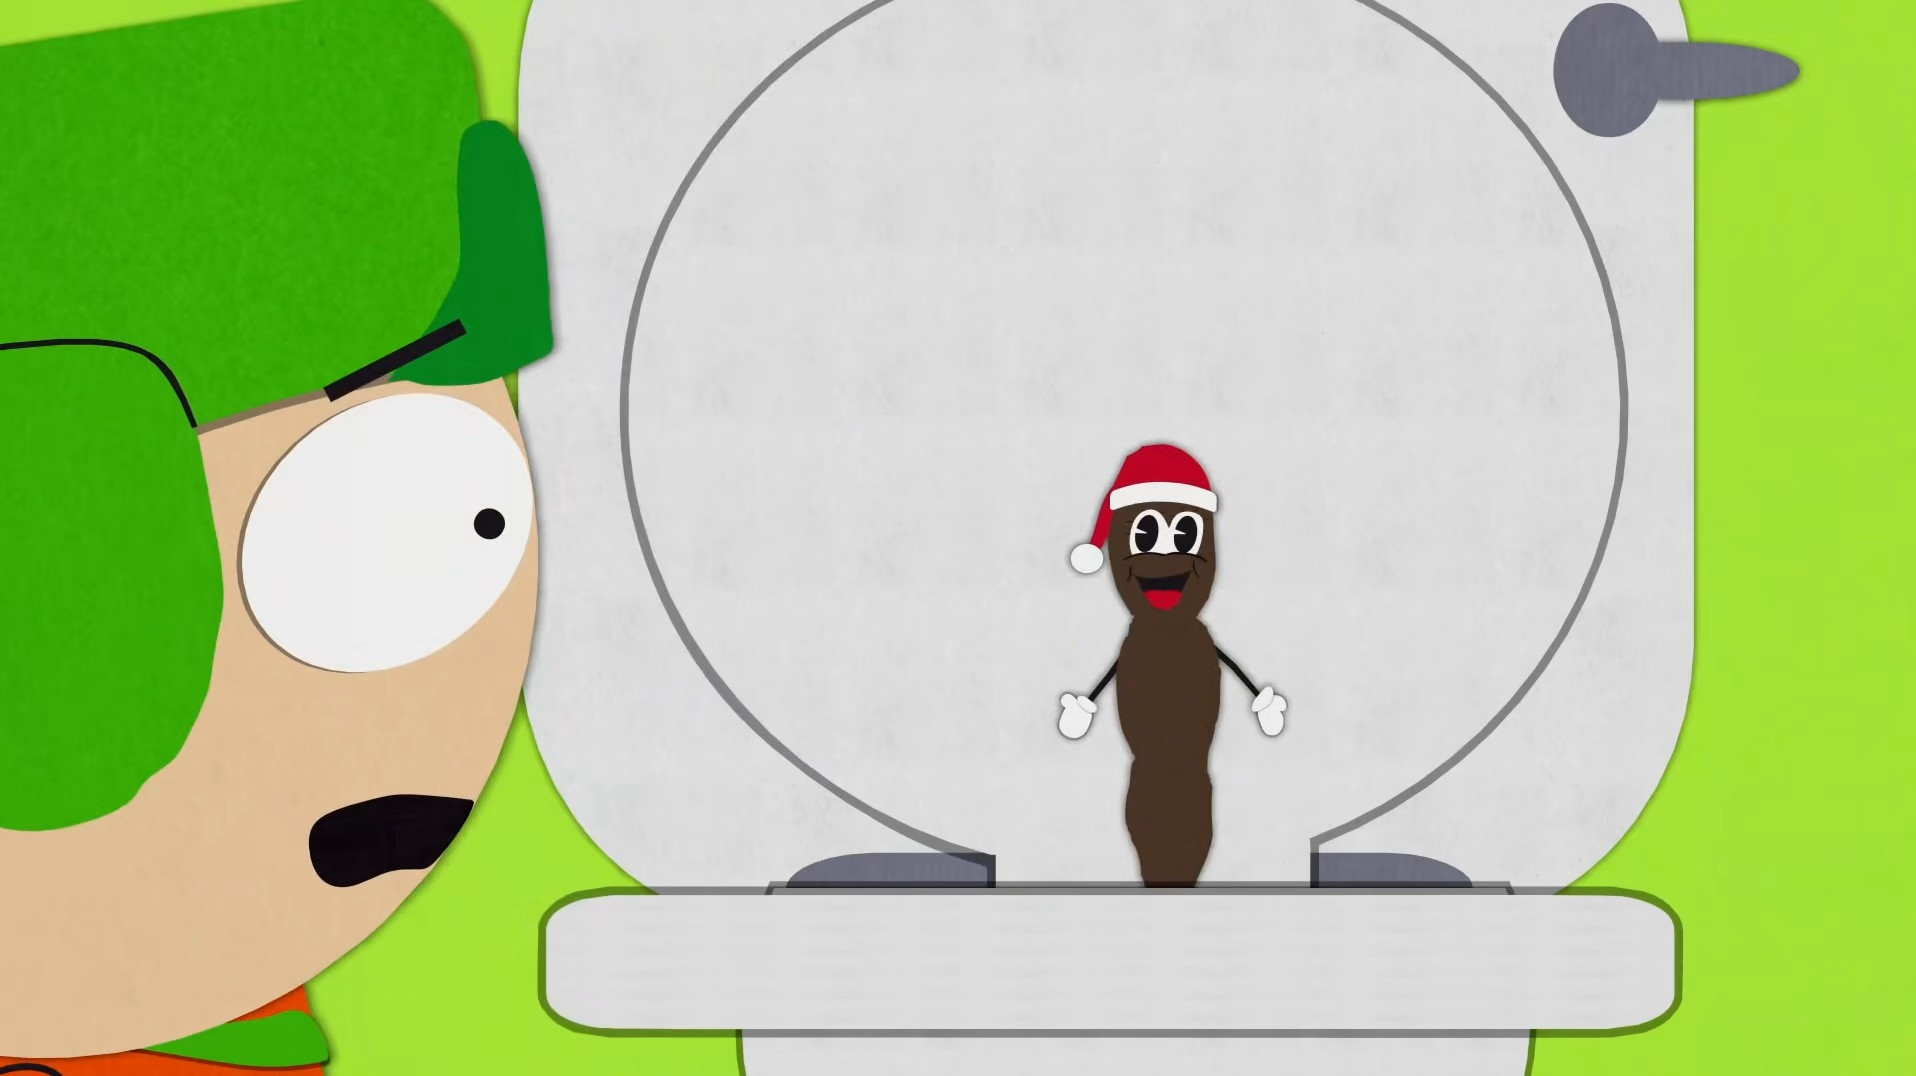 Mr Hankey The Christmas Poo.South Park Mr Hankey The Christmas Poo Tv Episode 1997